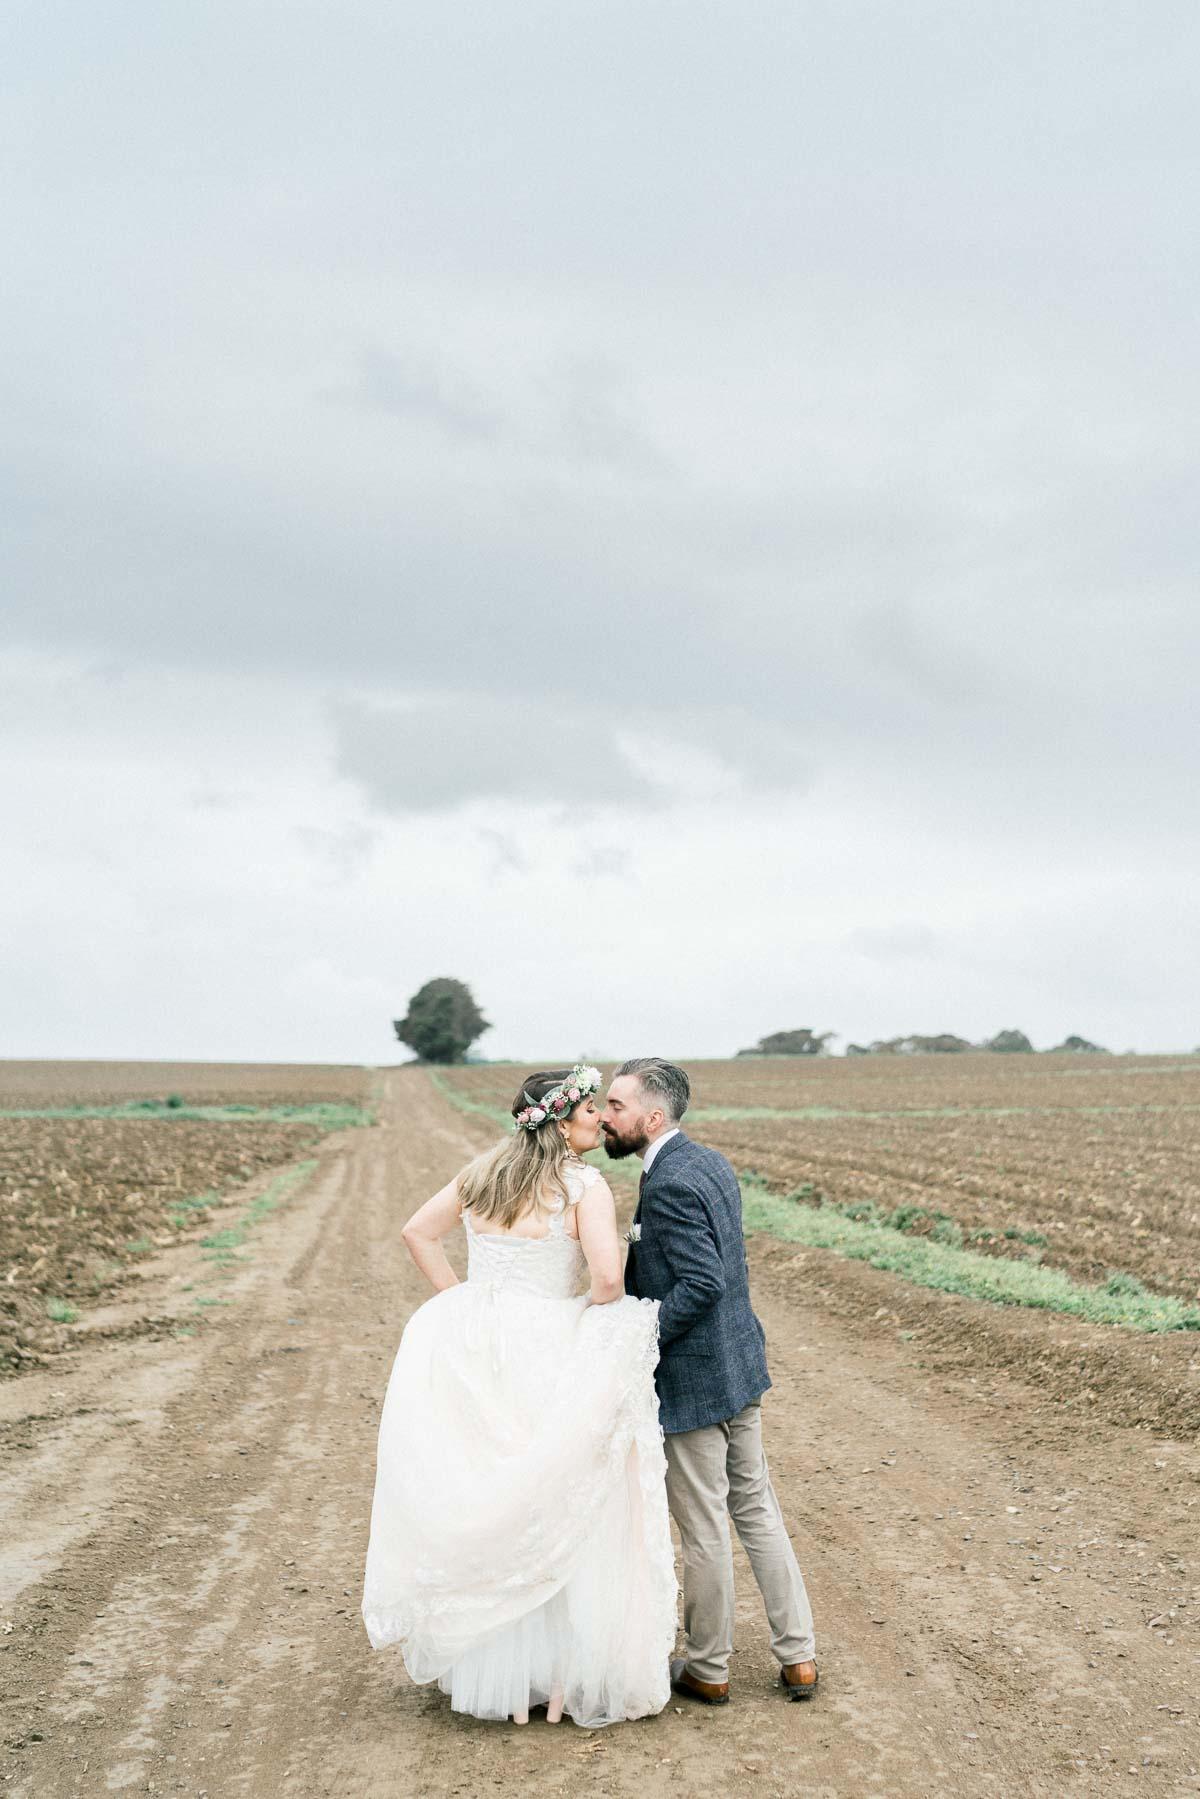 adams-farm-coldstream-yarra-valley-wedding-heart+soul-weddings-kel-jarryd-05498.jpg